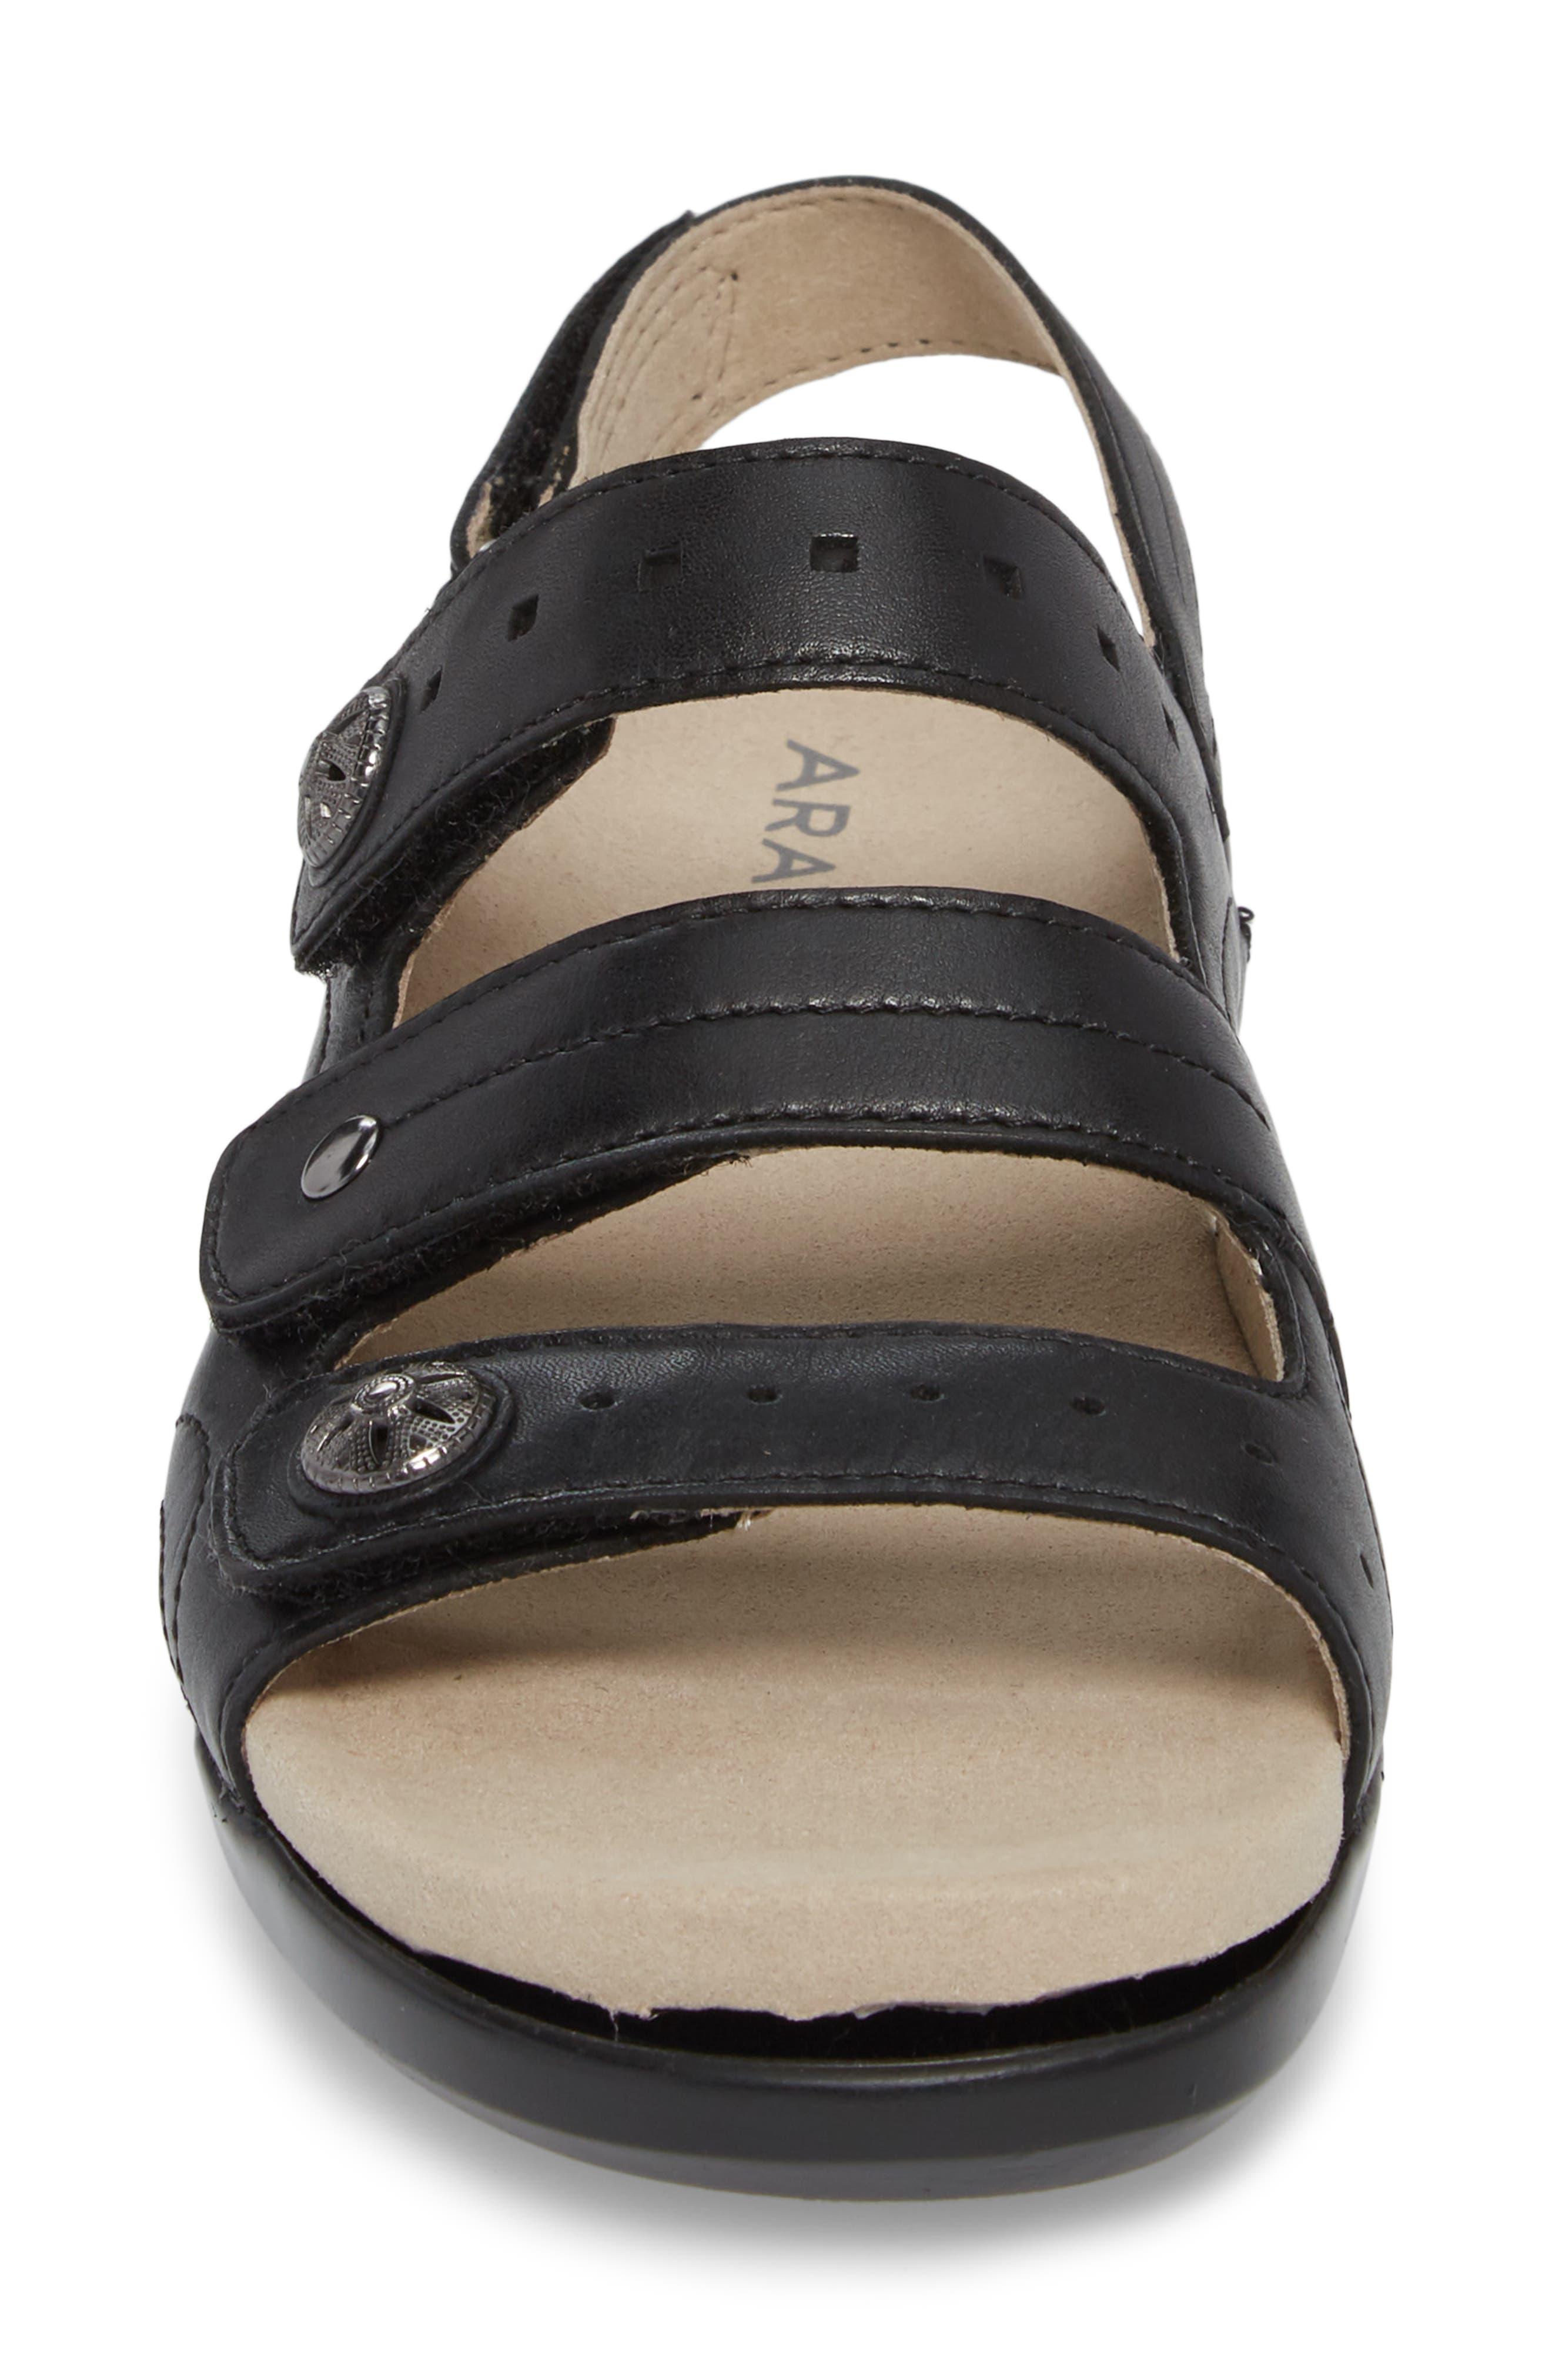 Three Strap Sandal,                             Alternate thumbnail 4, color,                             BLACK LEATHER